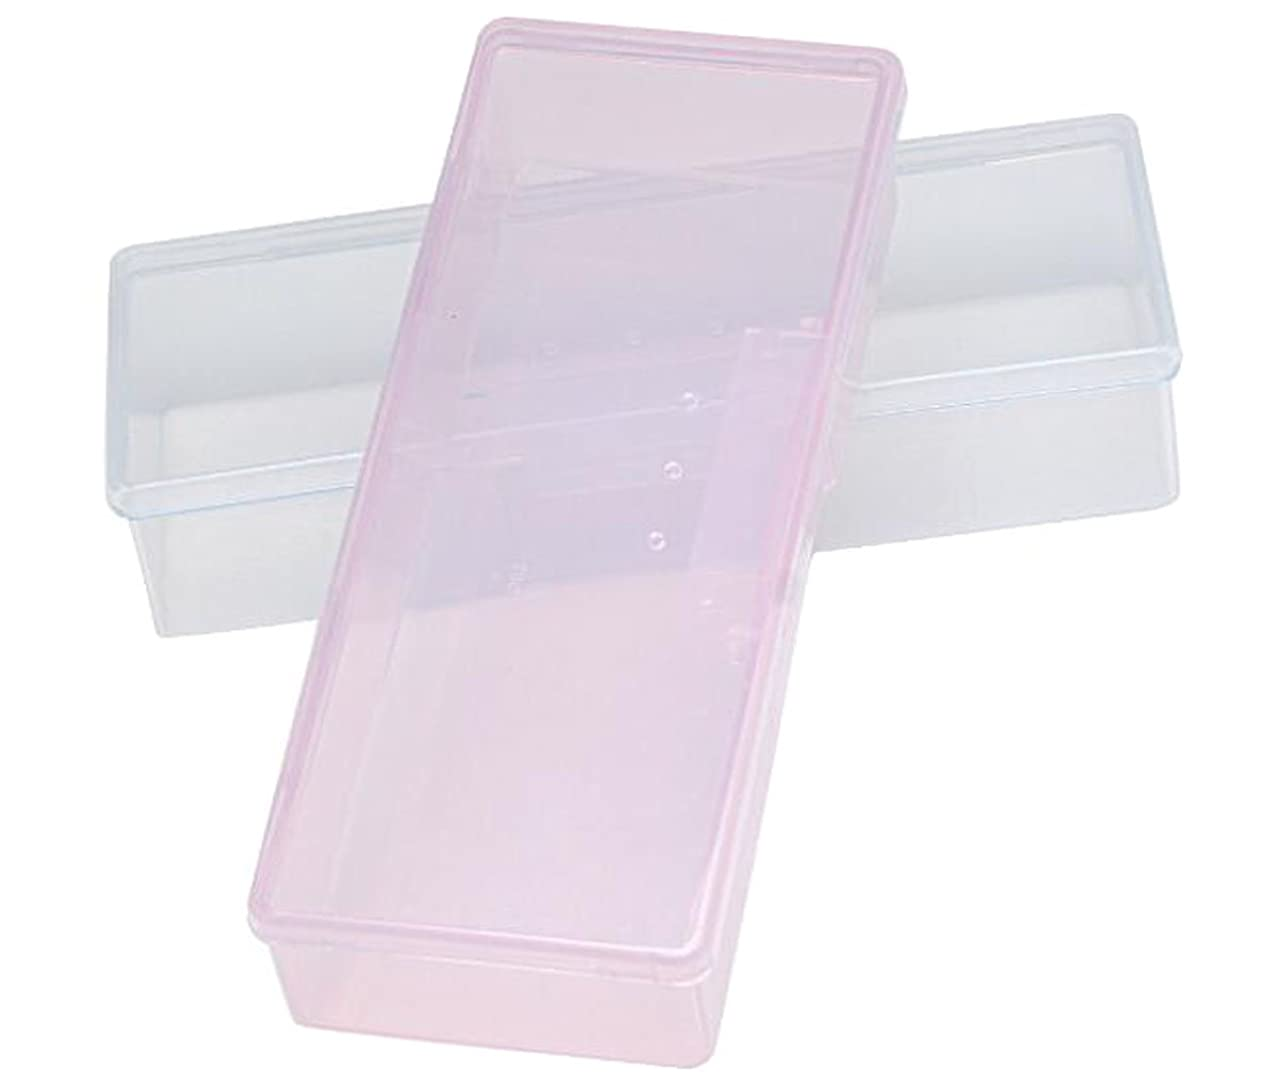 2 Pcs Empty Multifunctional Rectangular Storage Box - Nail Jewelry Storage Box Polished Manicure Toolbox